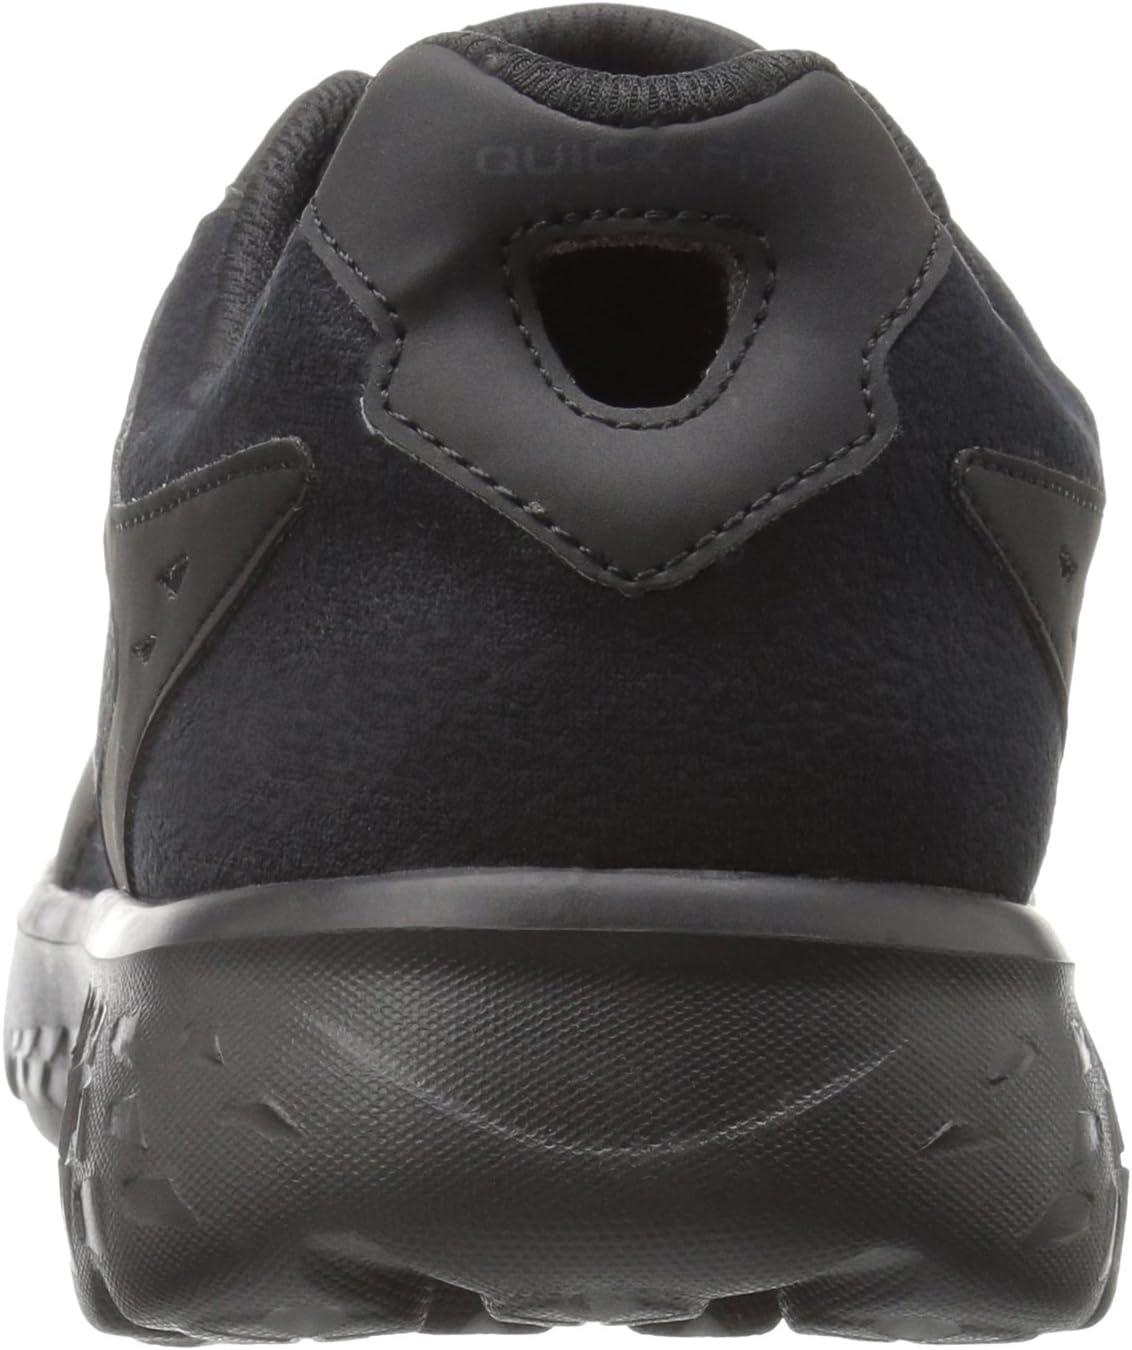 Skechers Performance Women's Go Run 400 Running Shoe Black